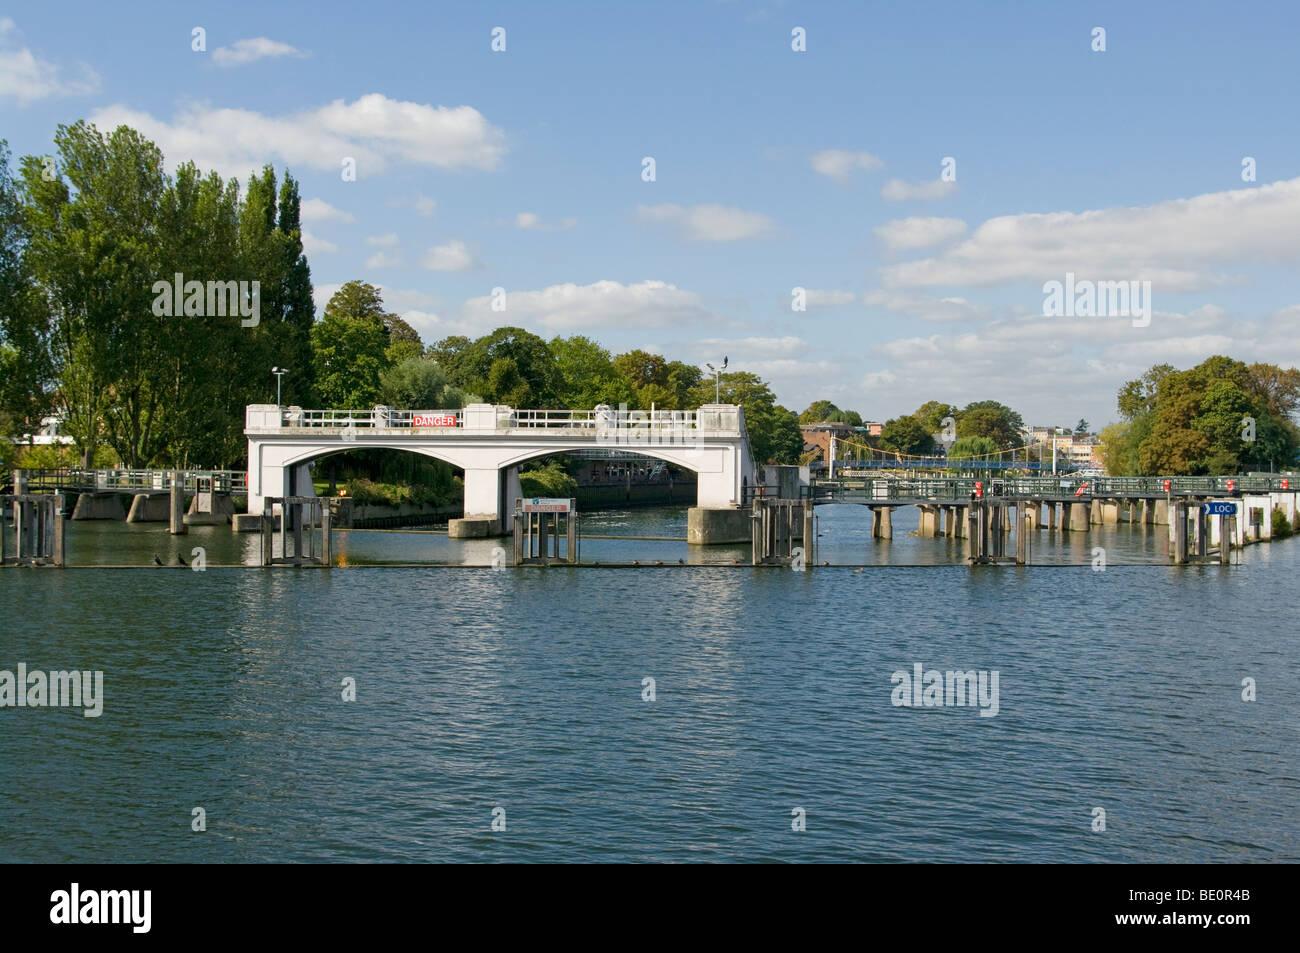 The Weir At Teddington Lock On The River Thames England Stock Photo